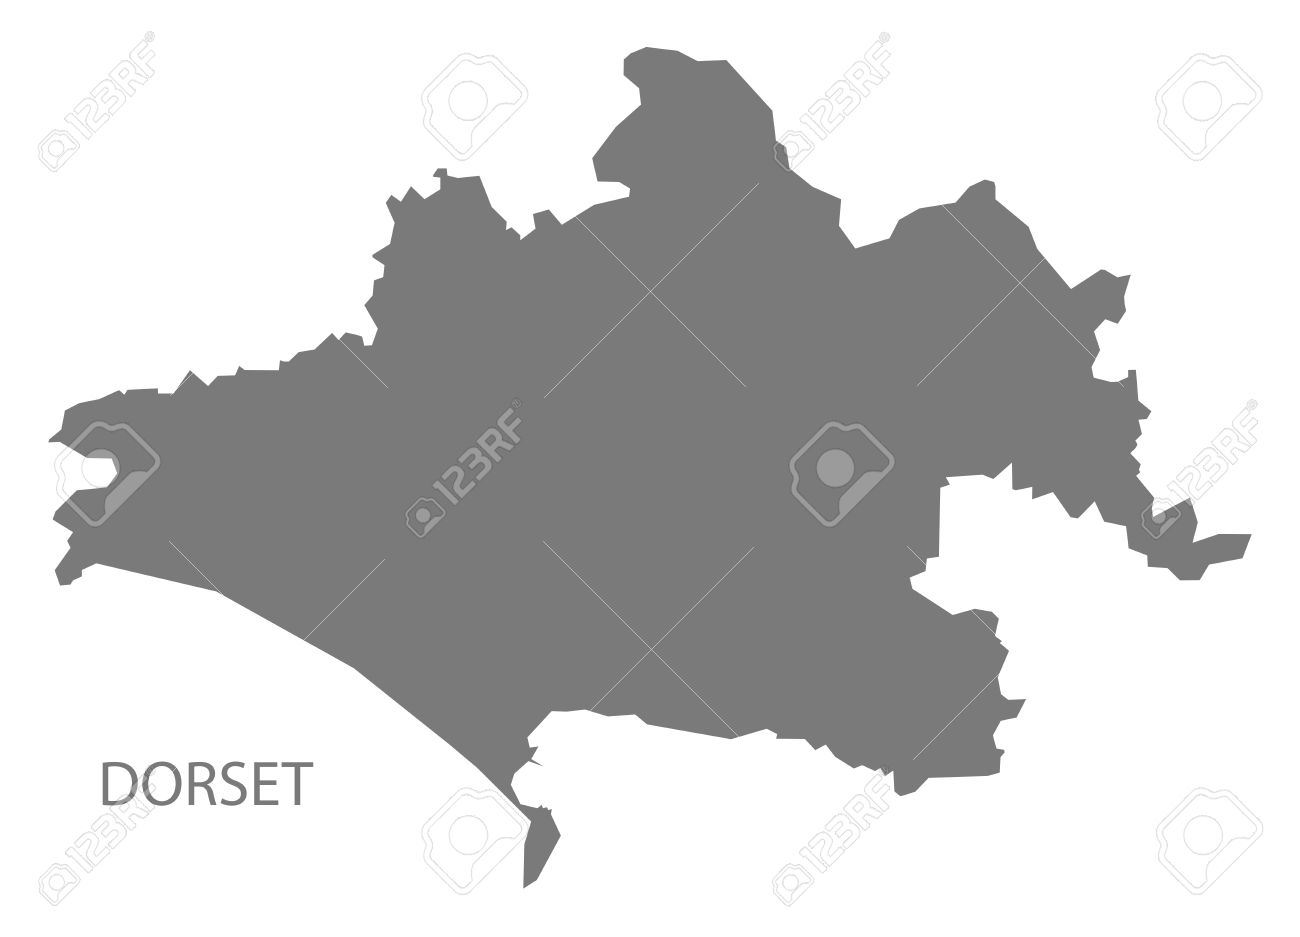 Map Of Uk Dorset.Dorset County Map England Uk Grey Illustration Silhouette Shape